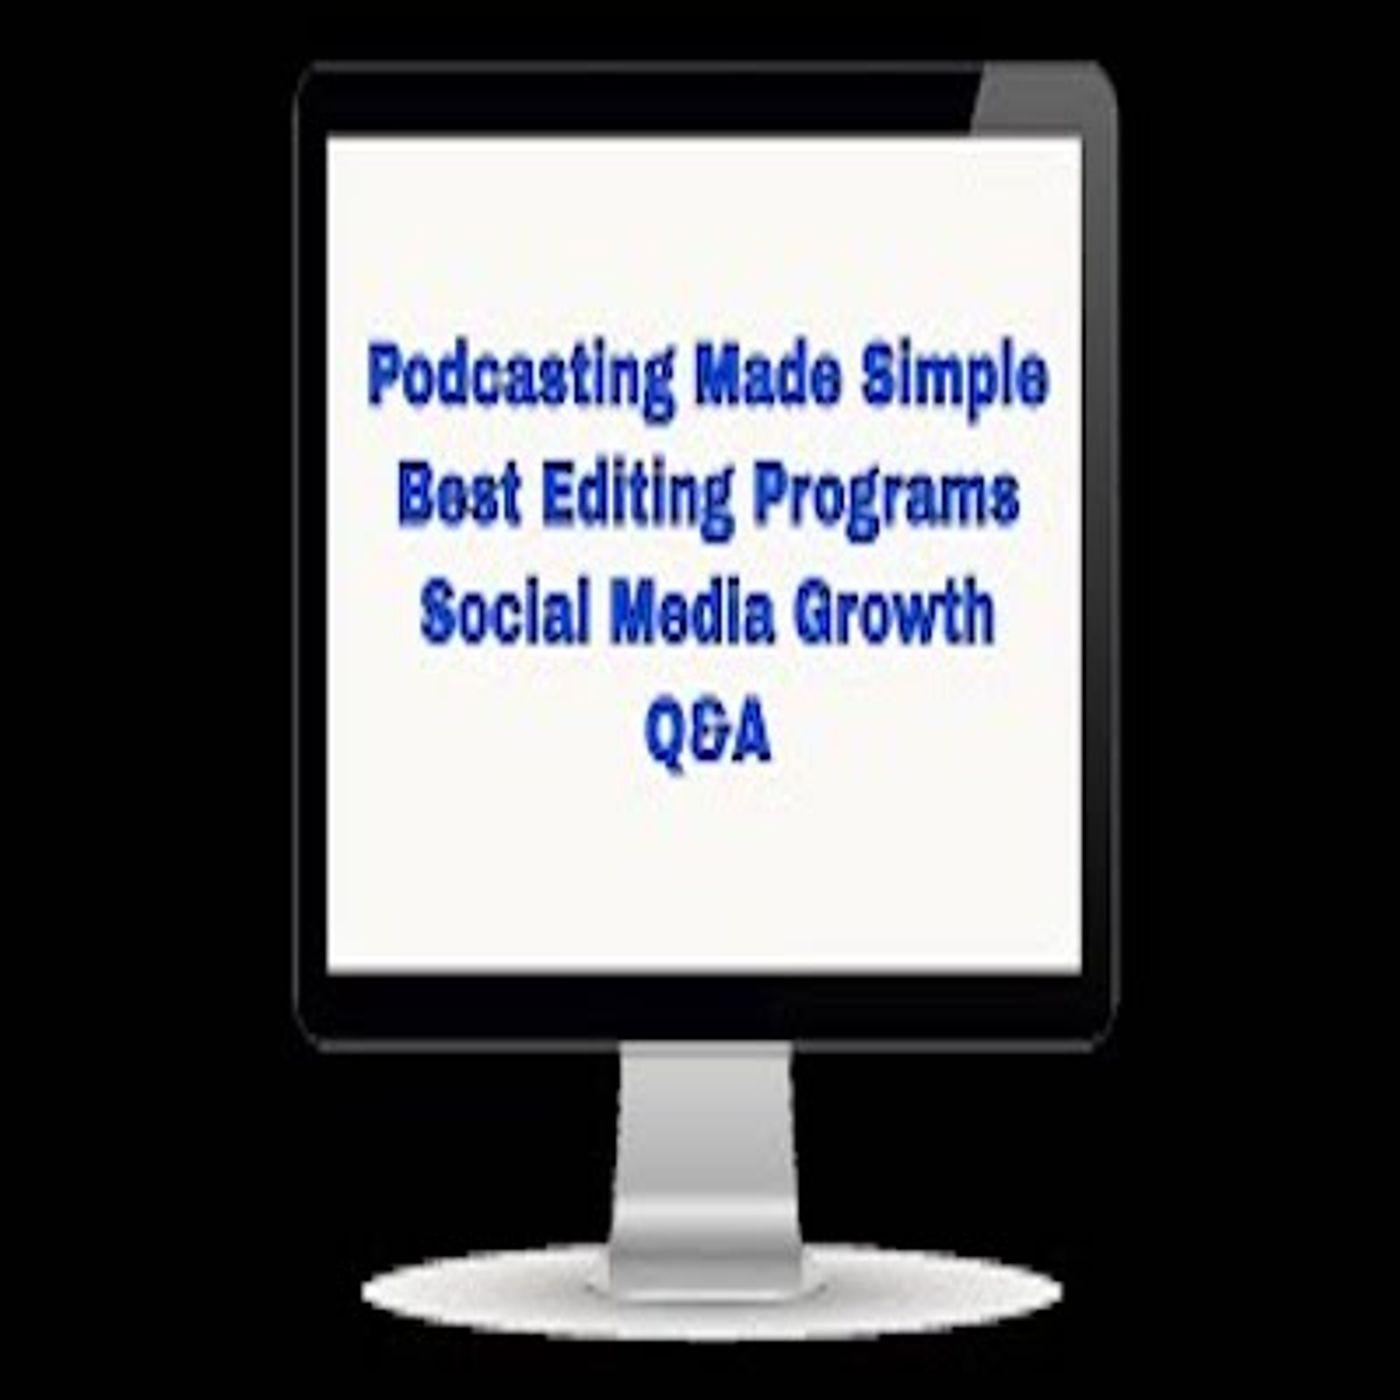 PMS: Best Editing Programs, Social Media Growth, Q&A